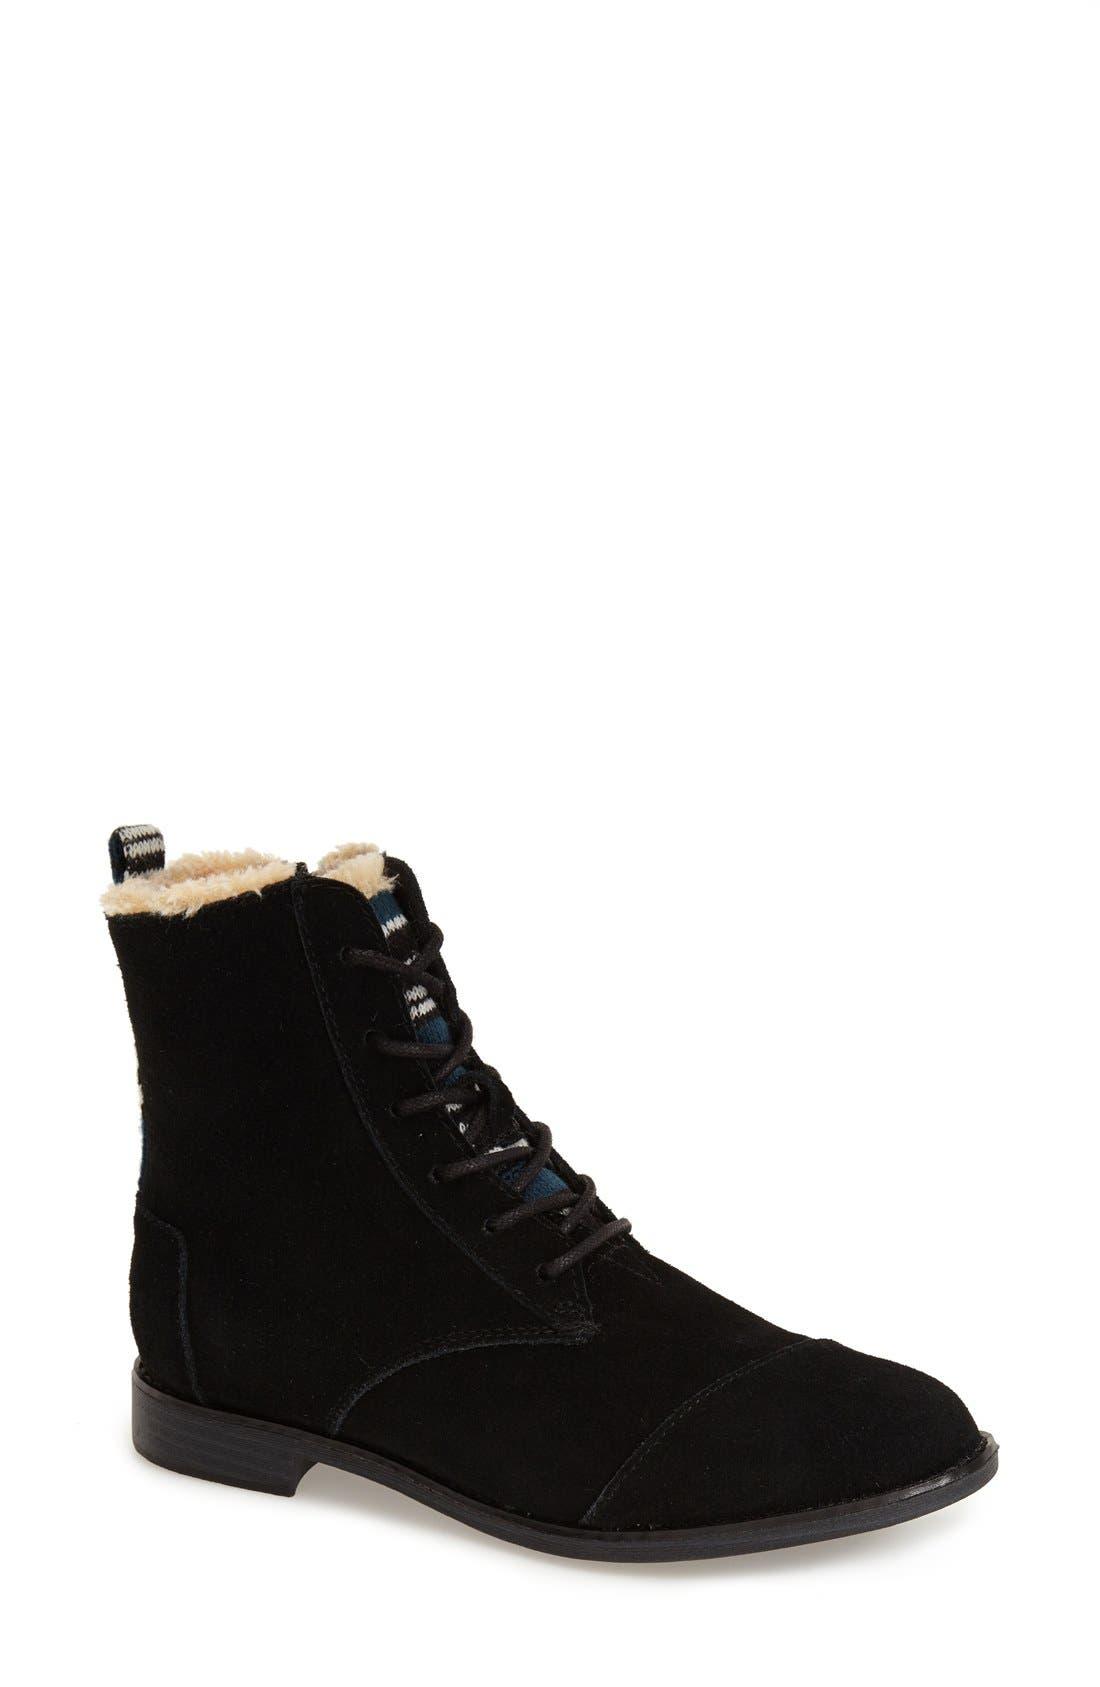 Main Image - TOMS 'Alpa'Water Resistant Suede Boot (Women)